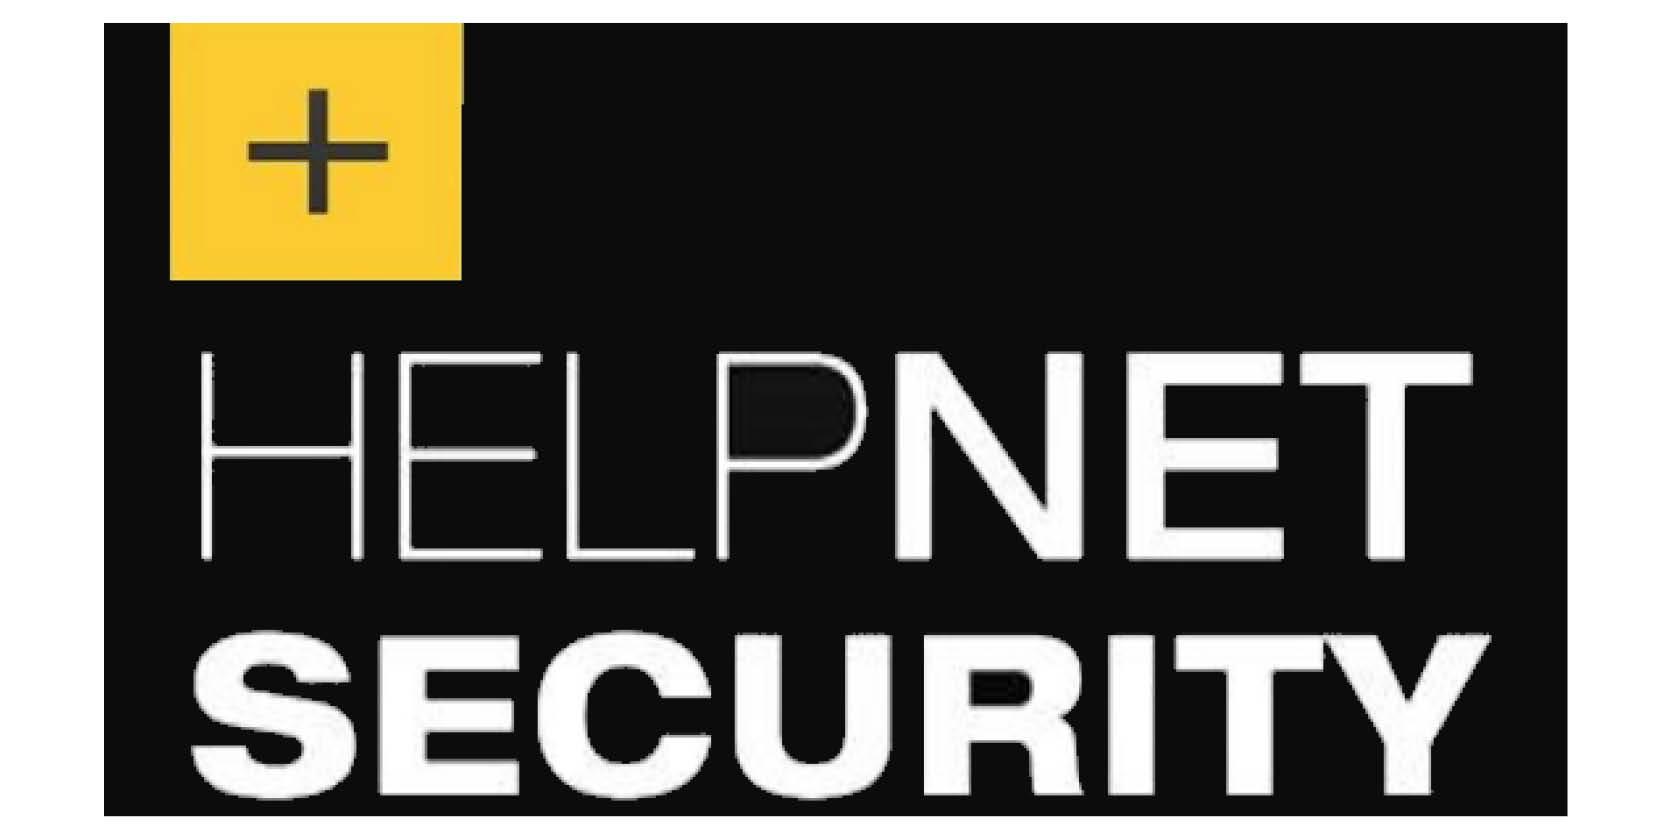 help net security logo